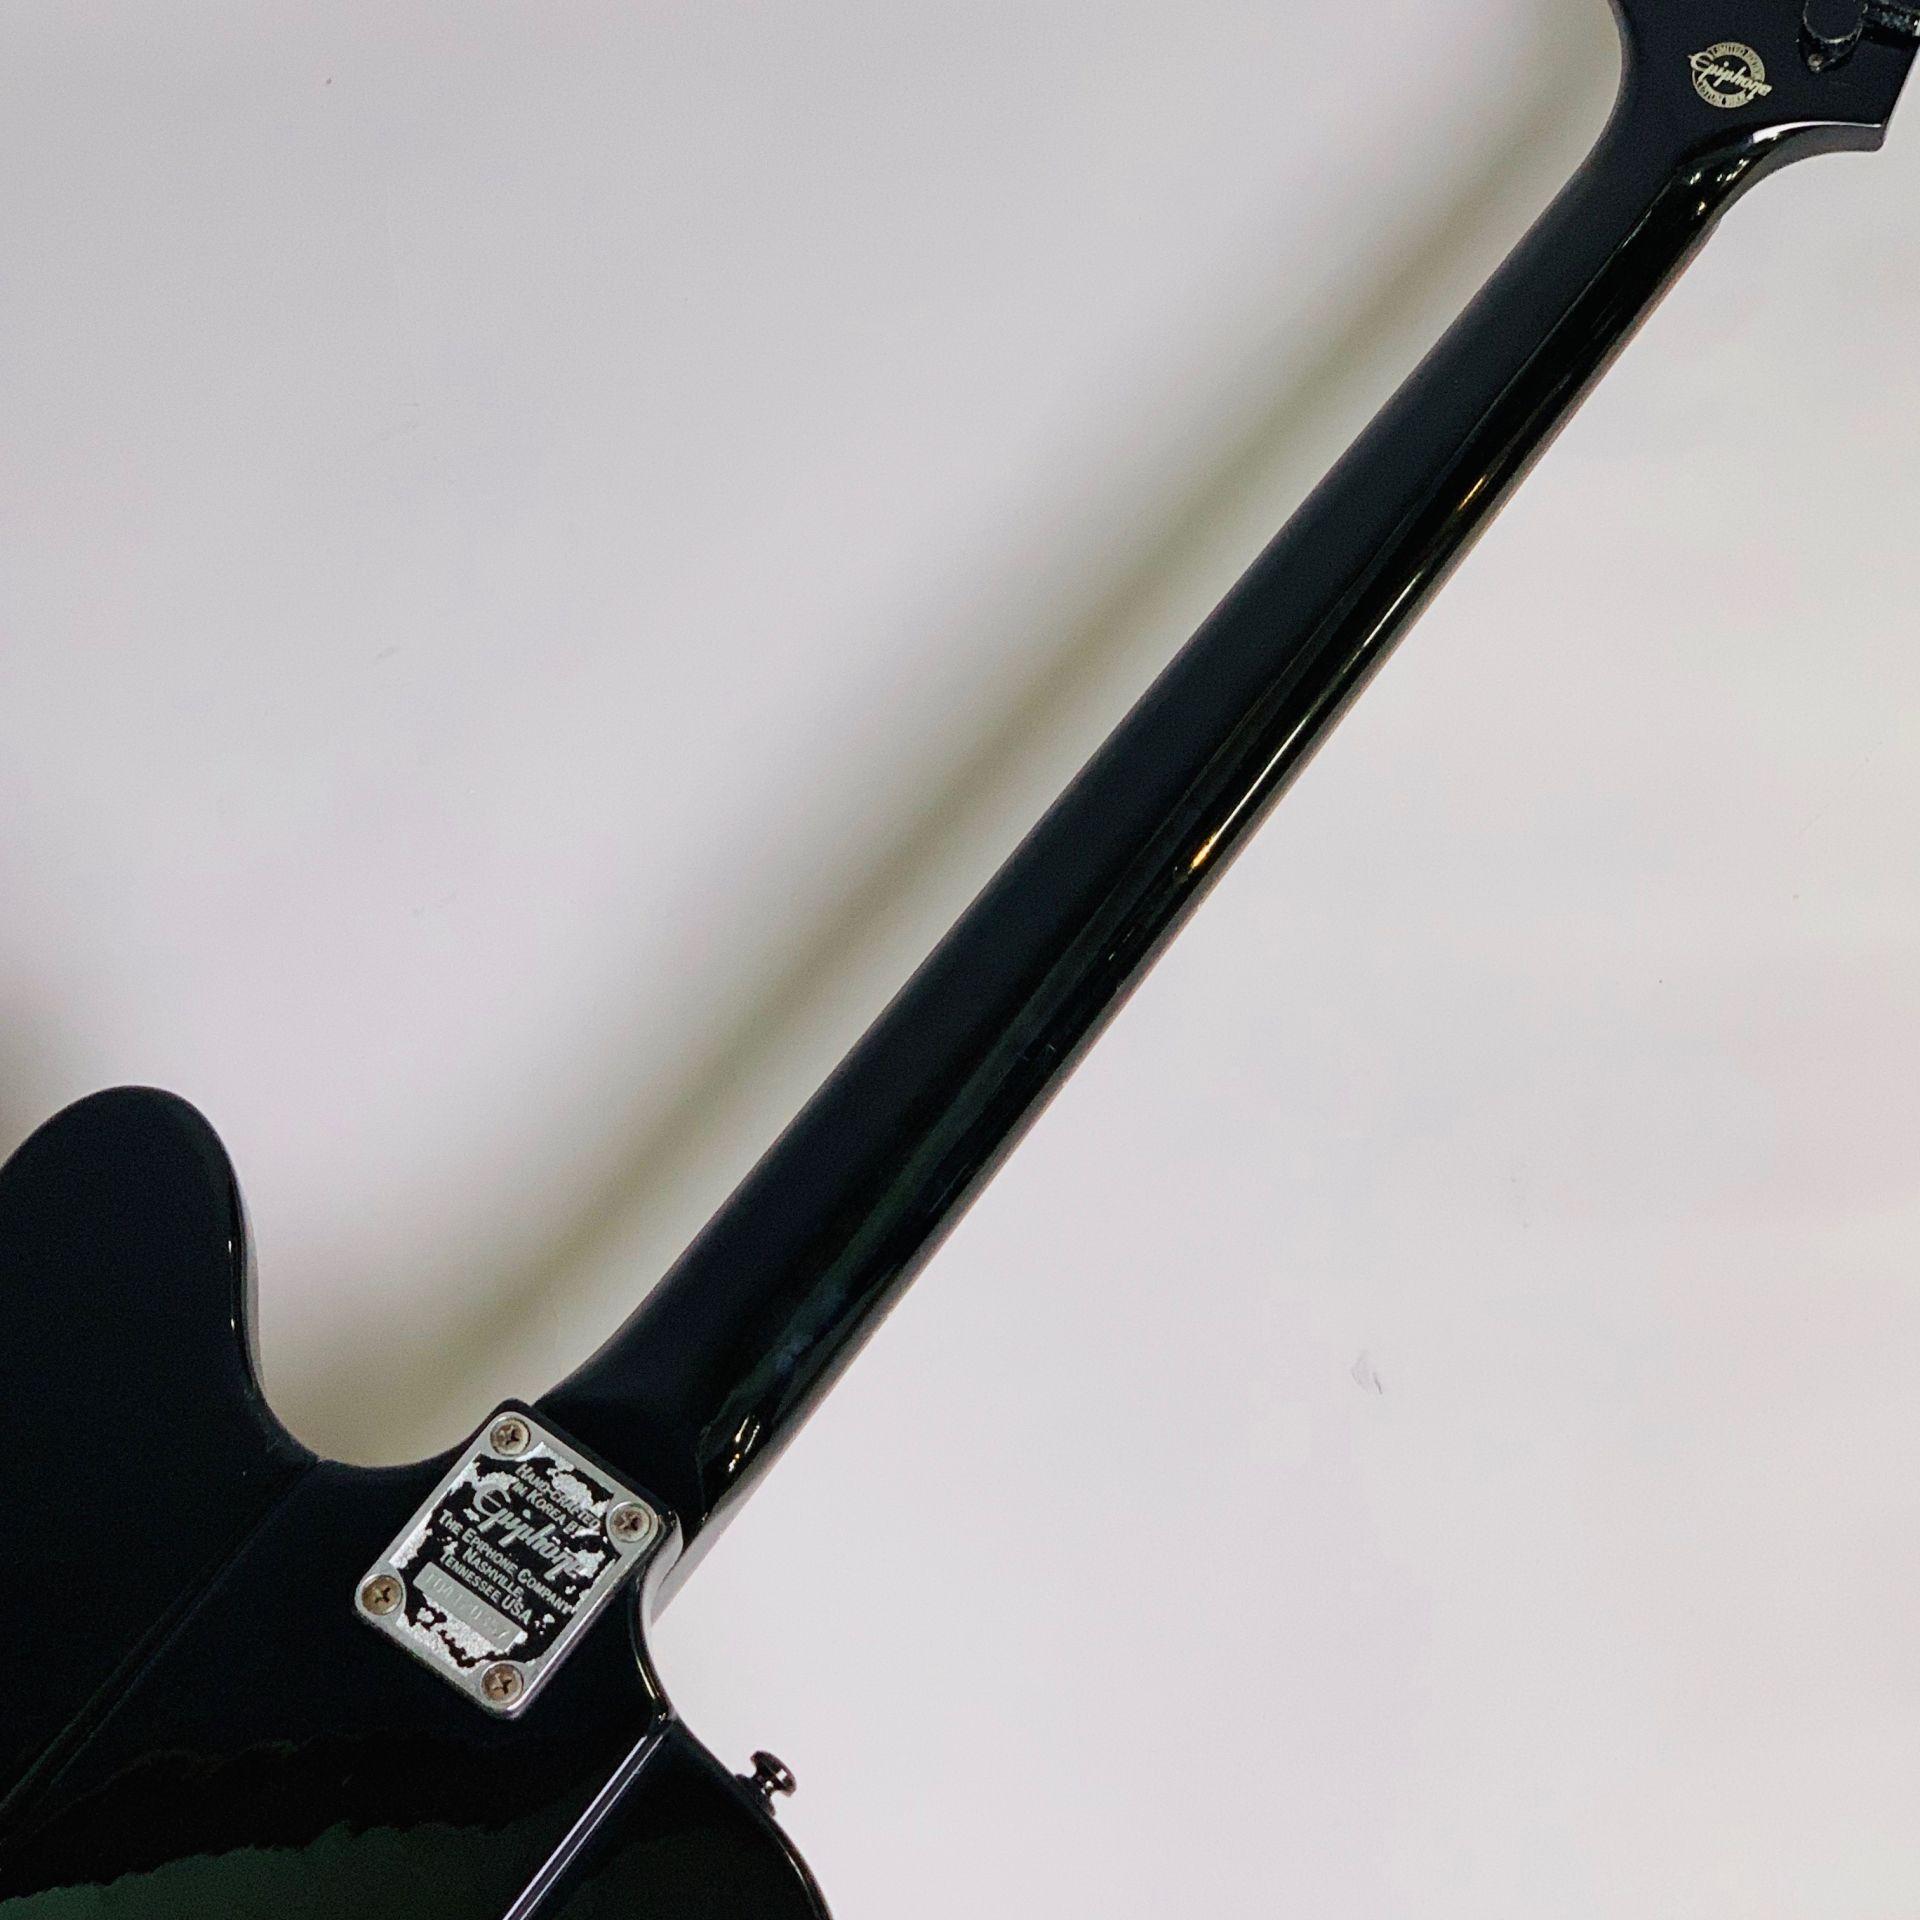 THUNDERBIRD サンダーバード Epiphone Custom Shop Limited Editionの全体画像(縦)